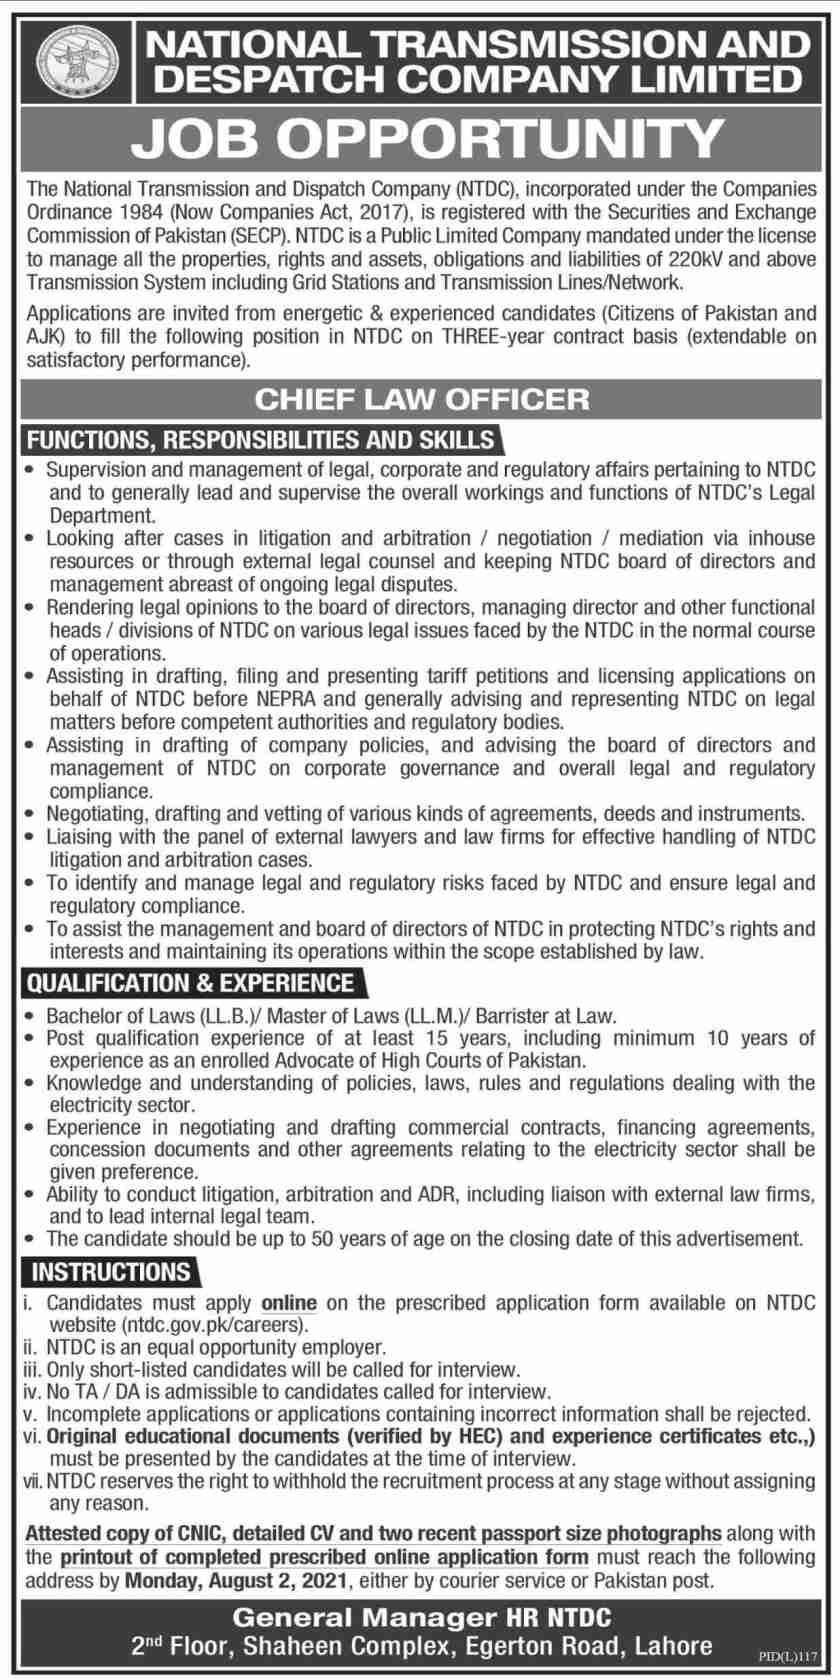 National Transmission & Despatch Company Limited NTDC Jobs 2021